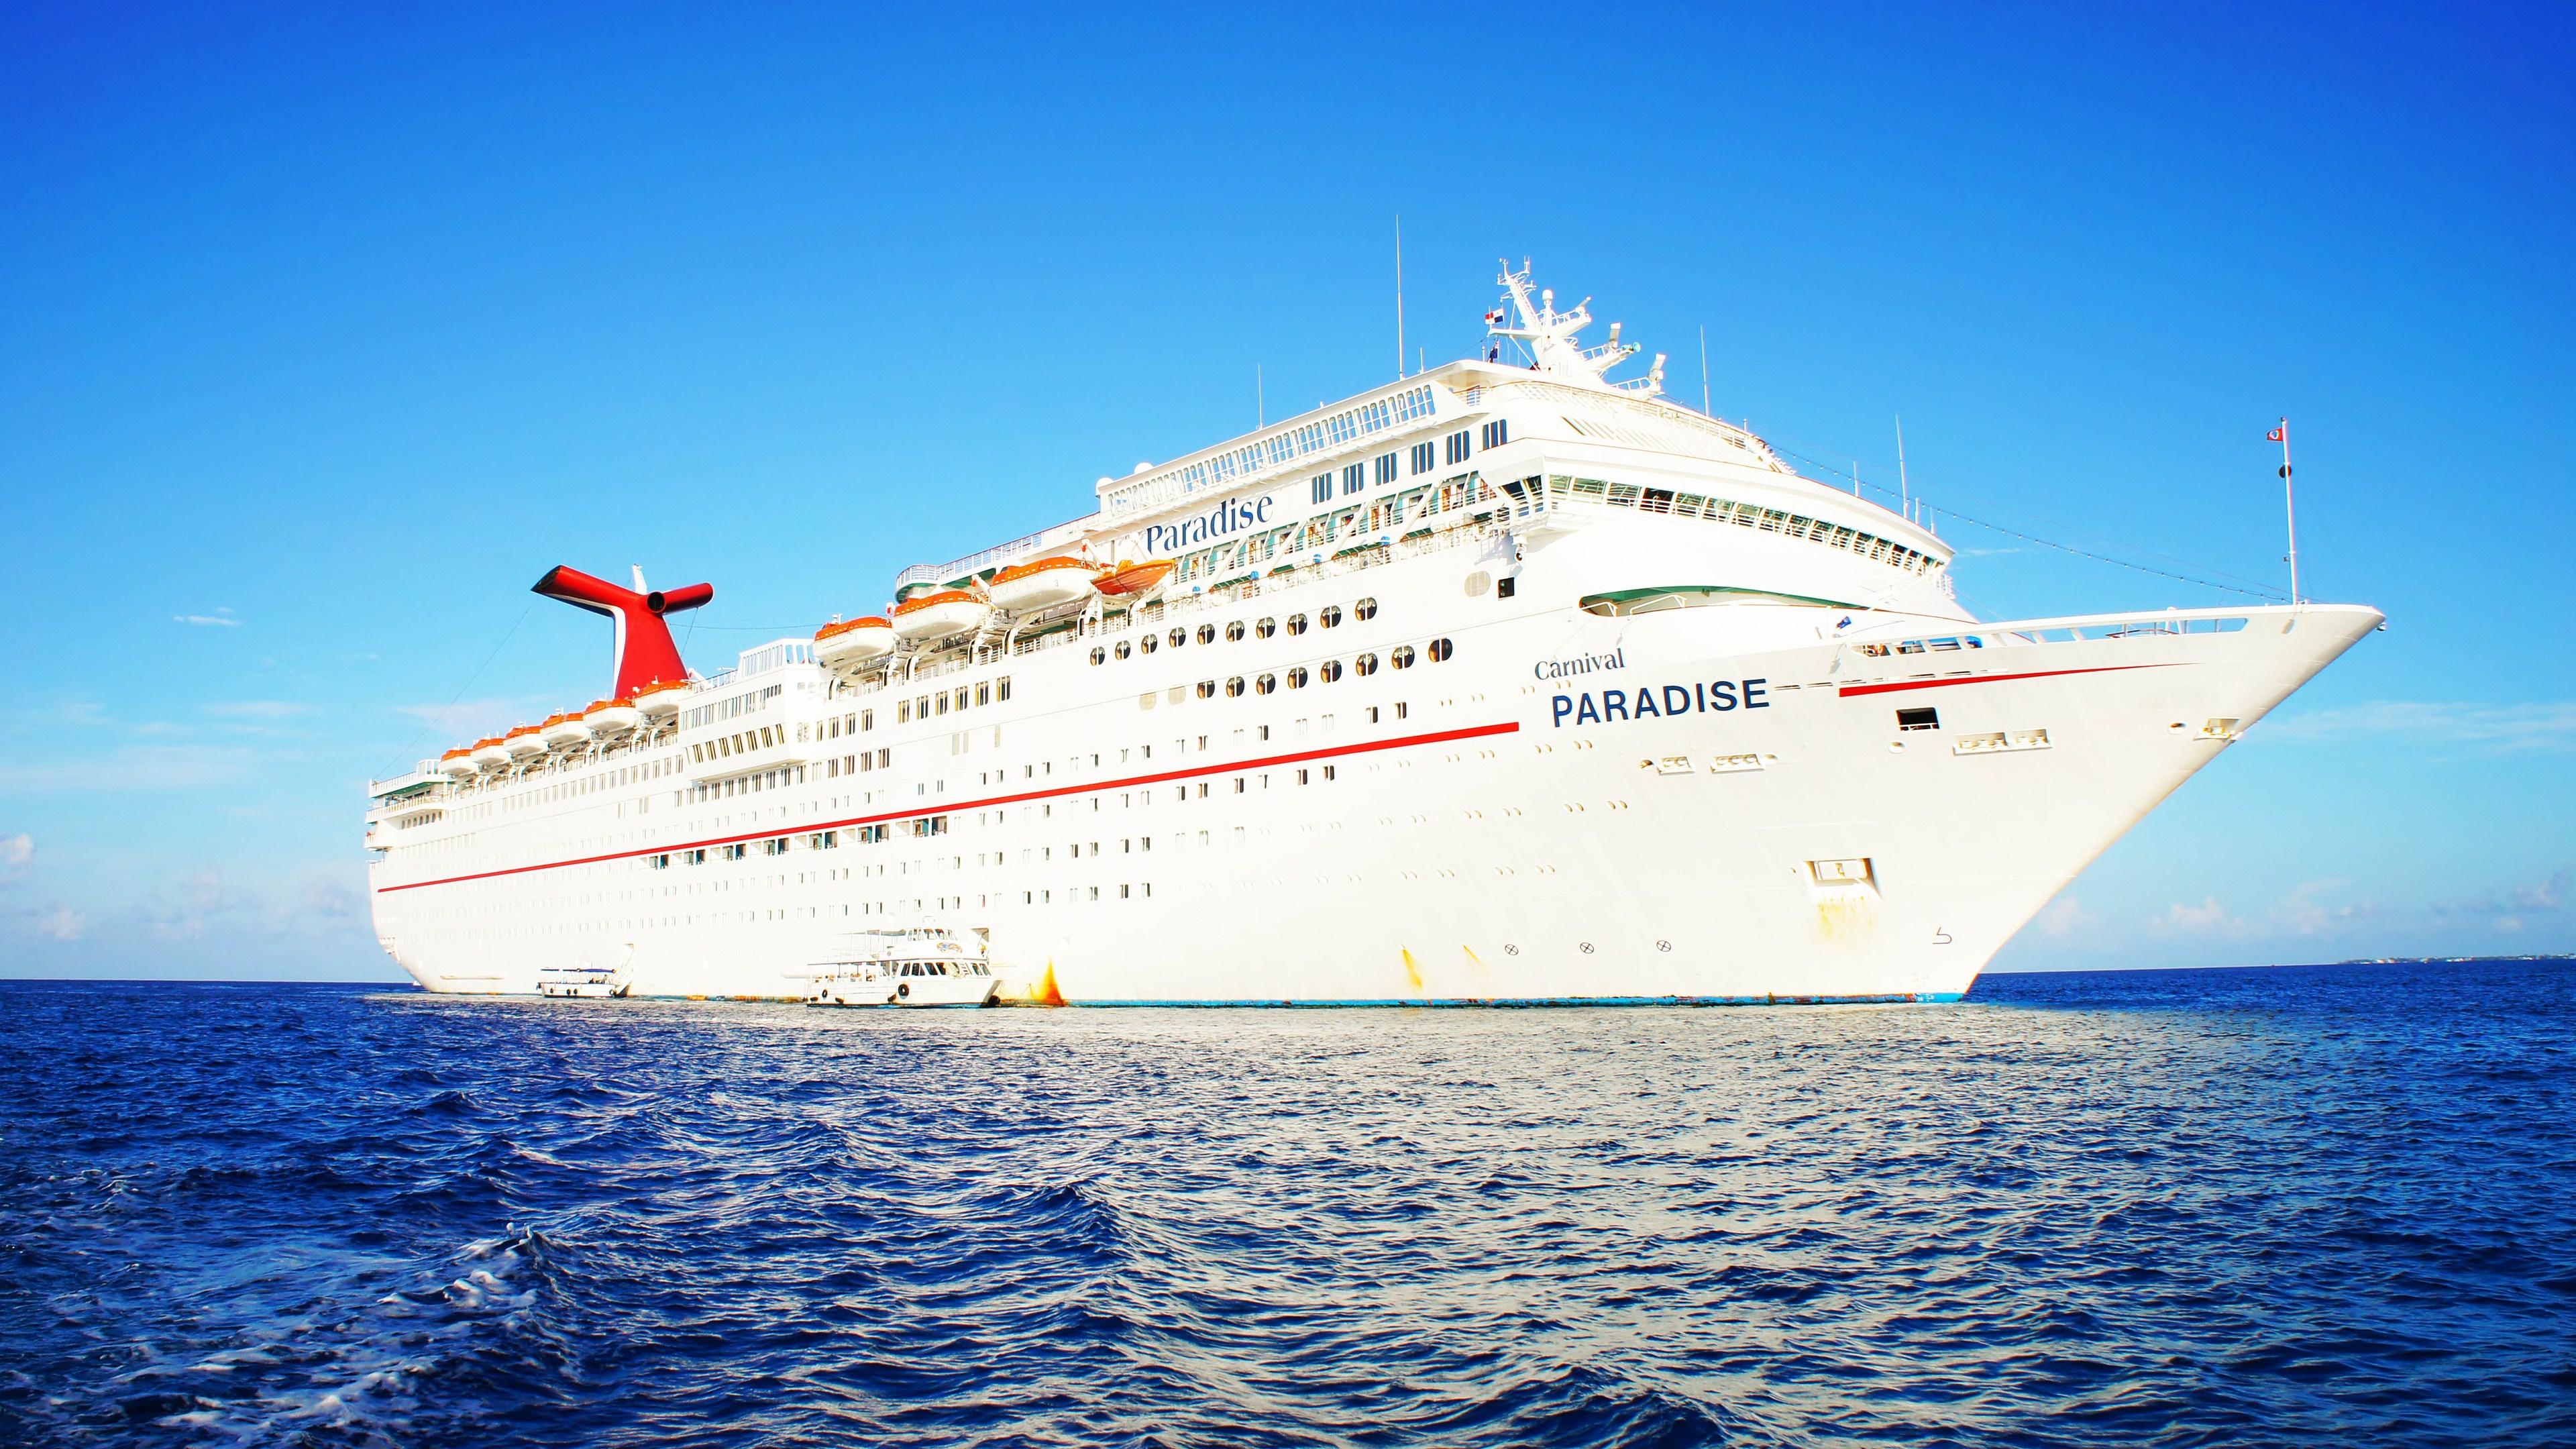 cruise ship Bilgisayar Duvar Katlar Masast Arka Planlar 3840x2160